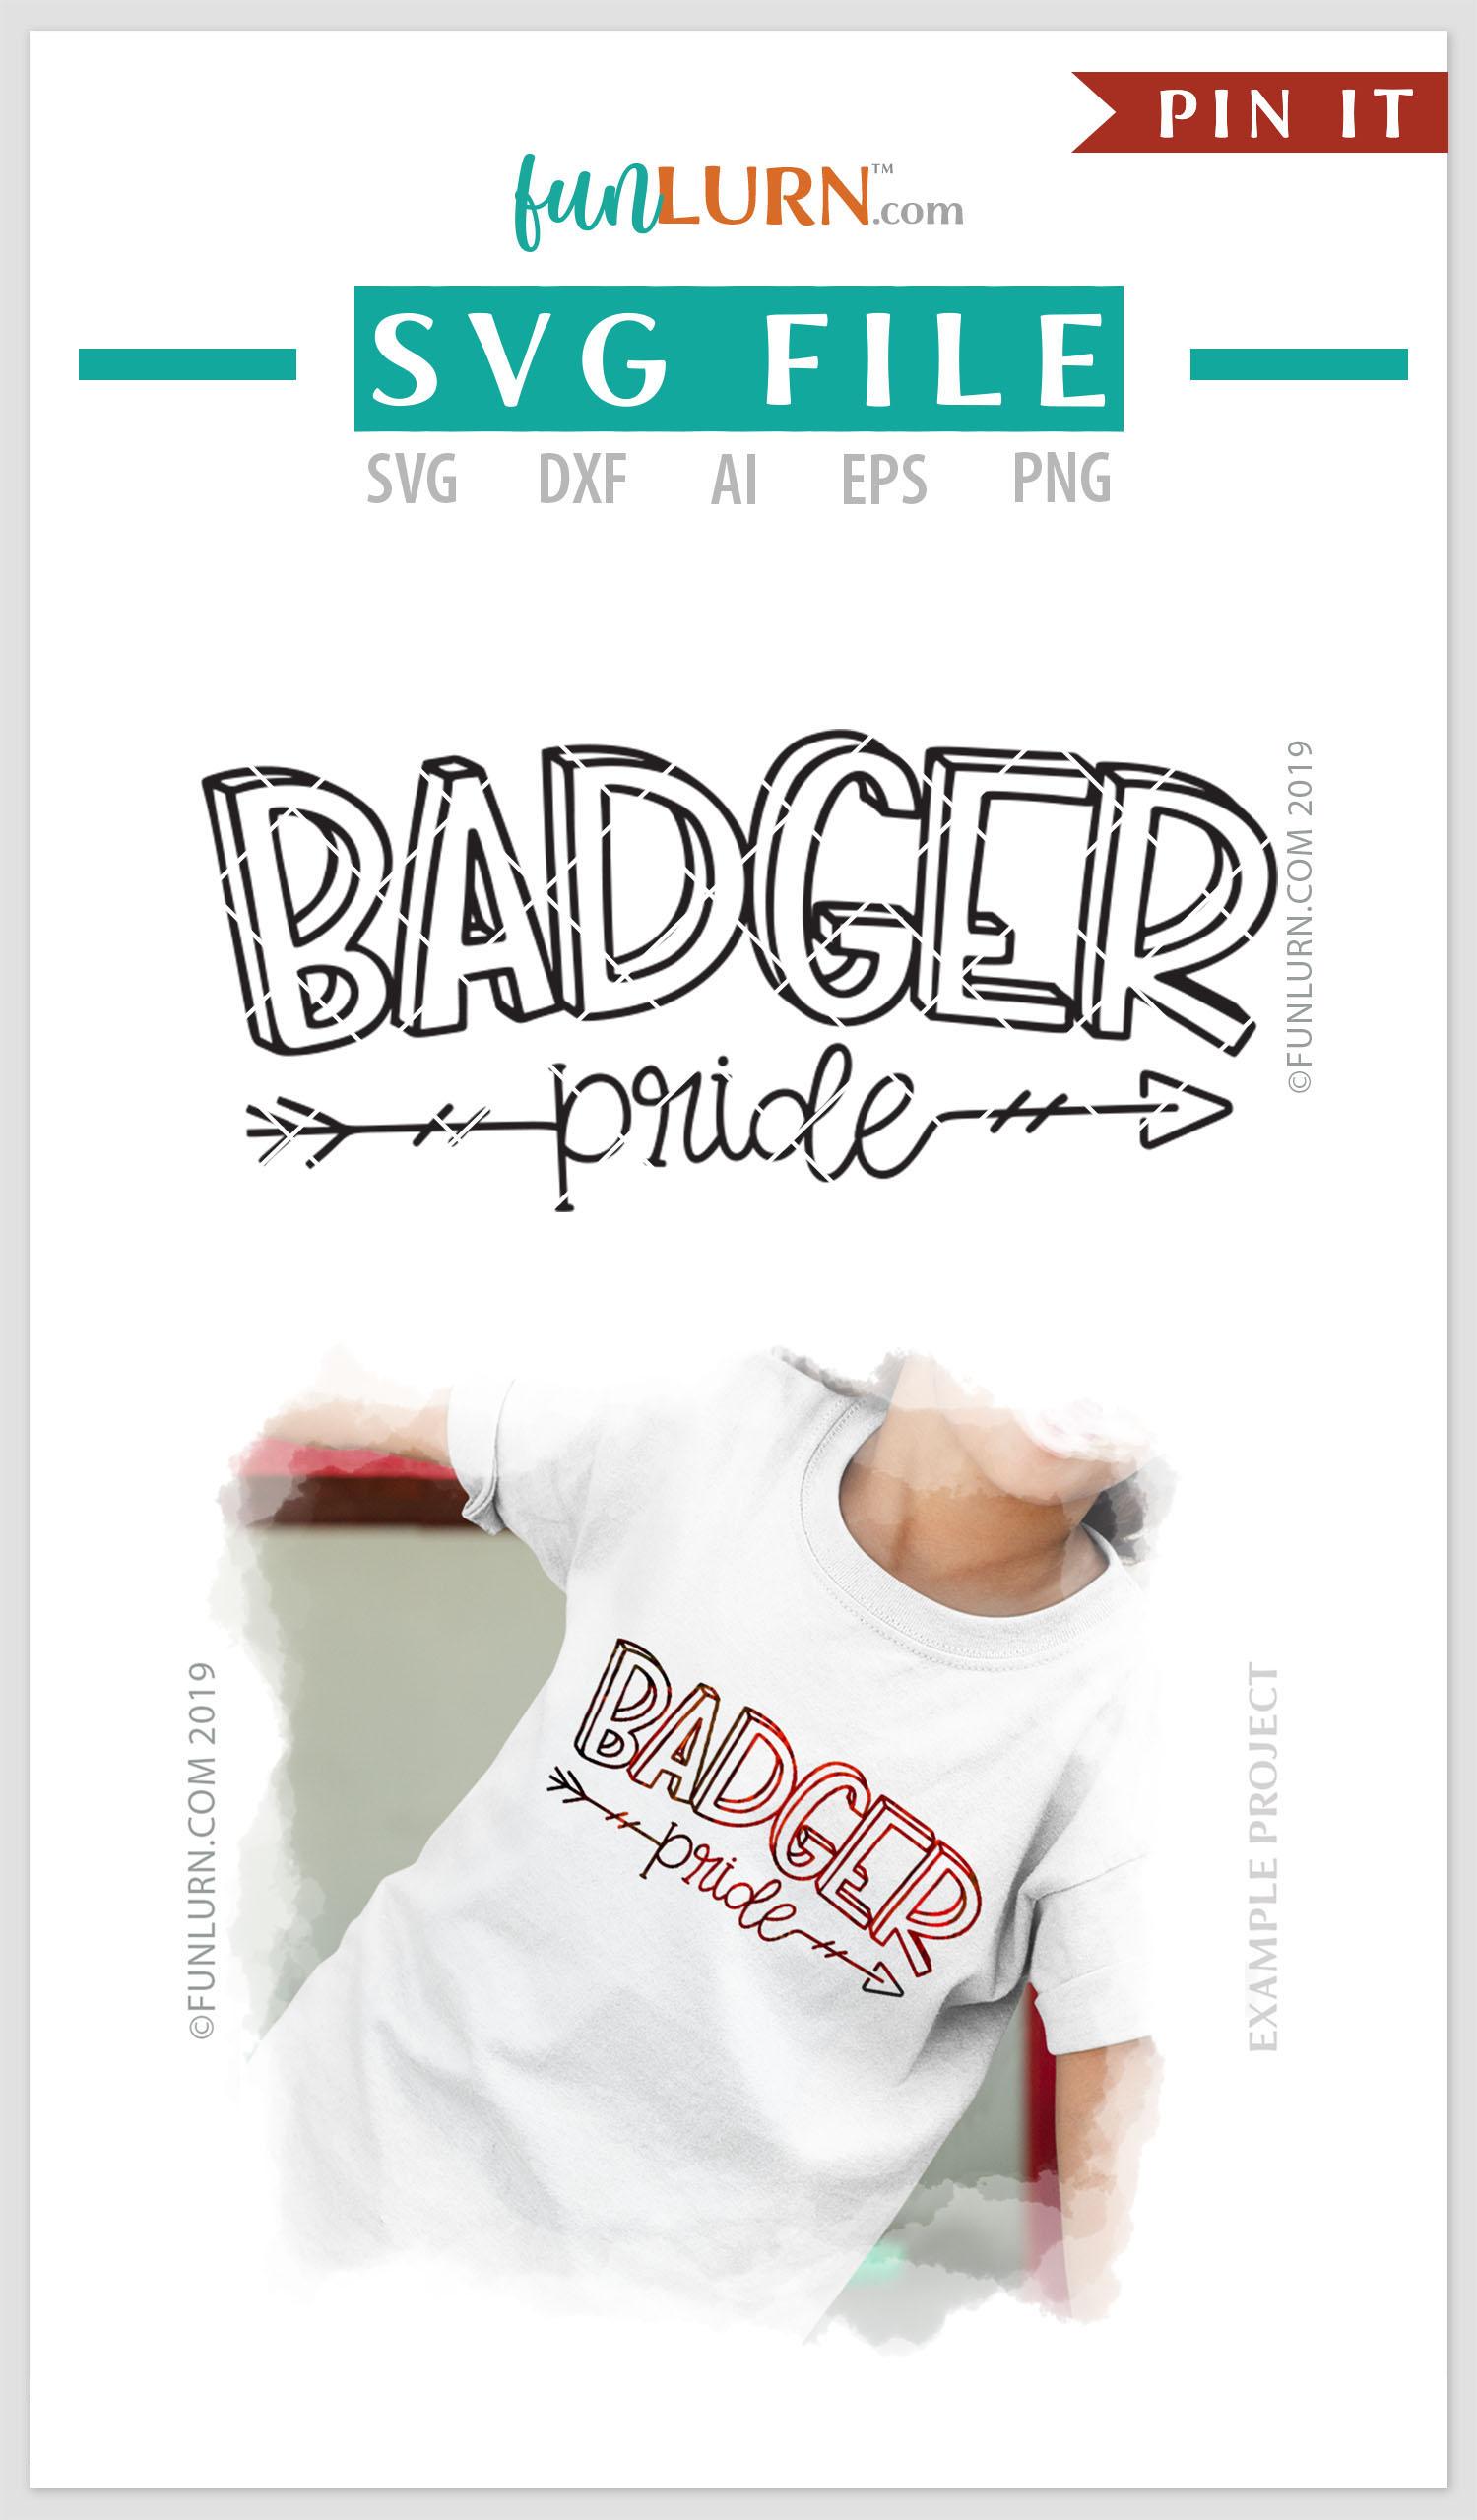 Badger Pride Team SVG Cut File example image 4